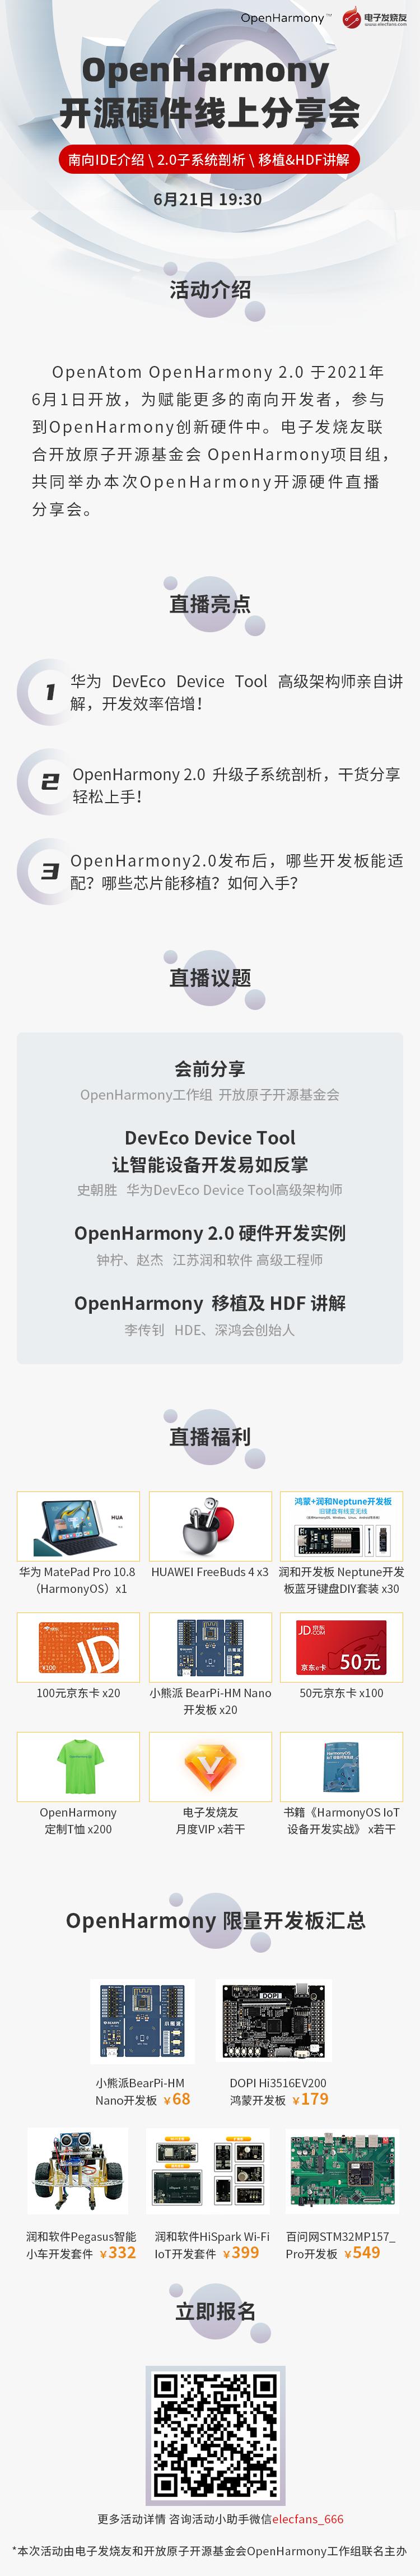 OpenHarmony开源硬件分享会,看直播抢3799华为 MatePad Pro等精美礼品